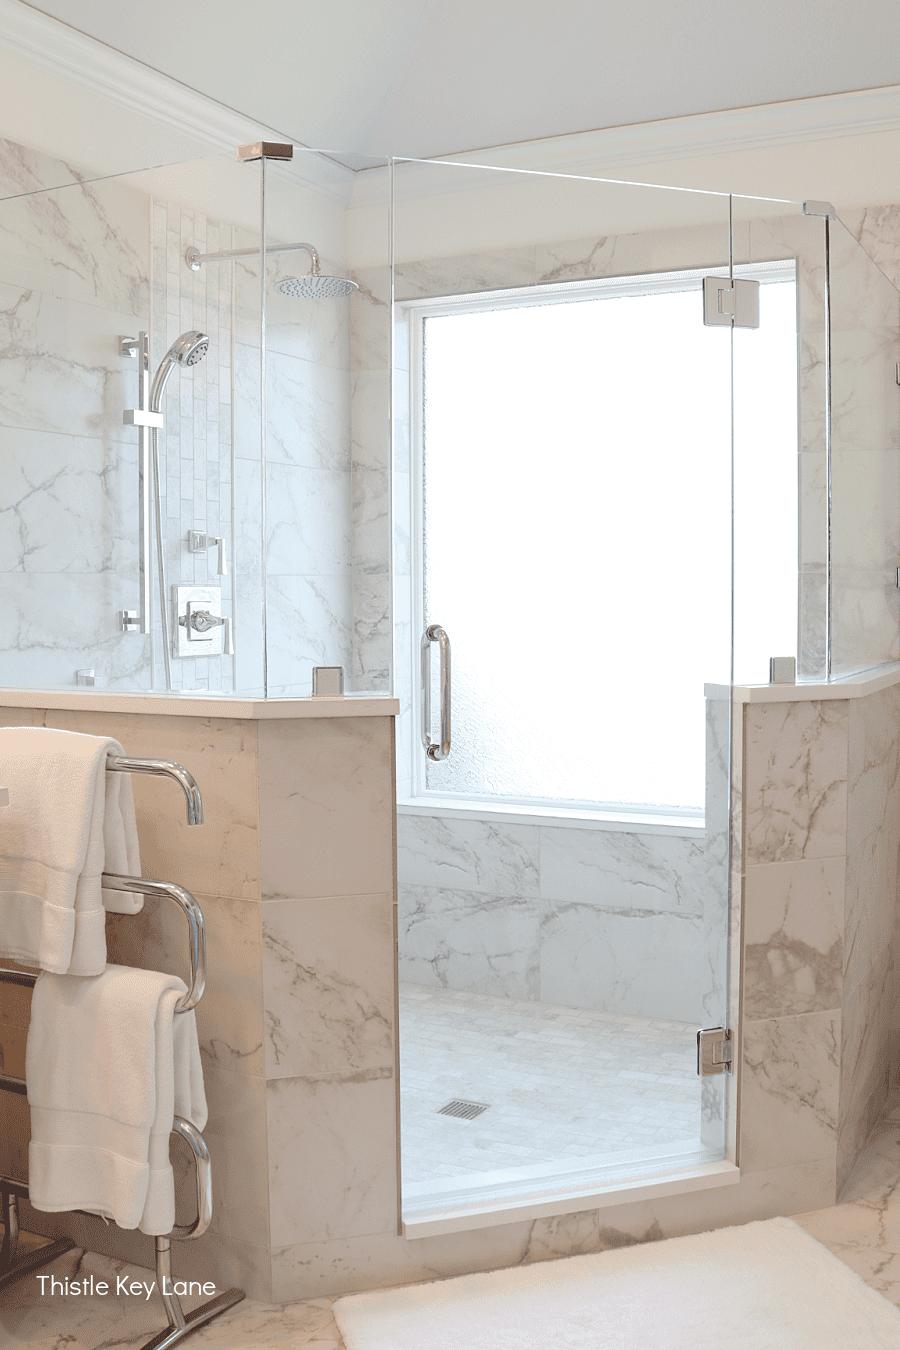 Gray and white tile shower, frameless glass and door.